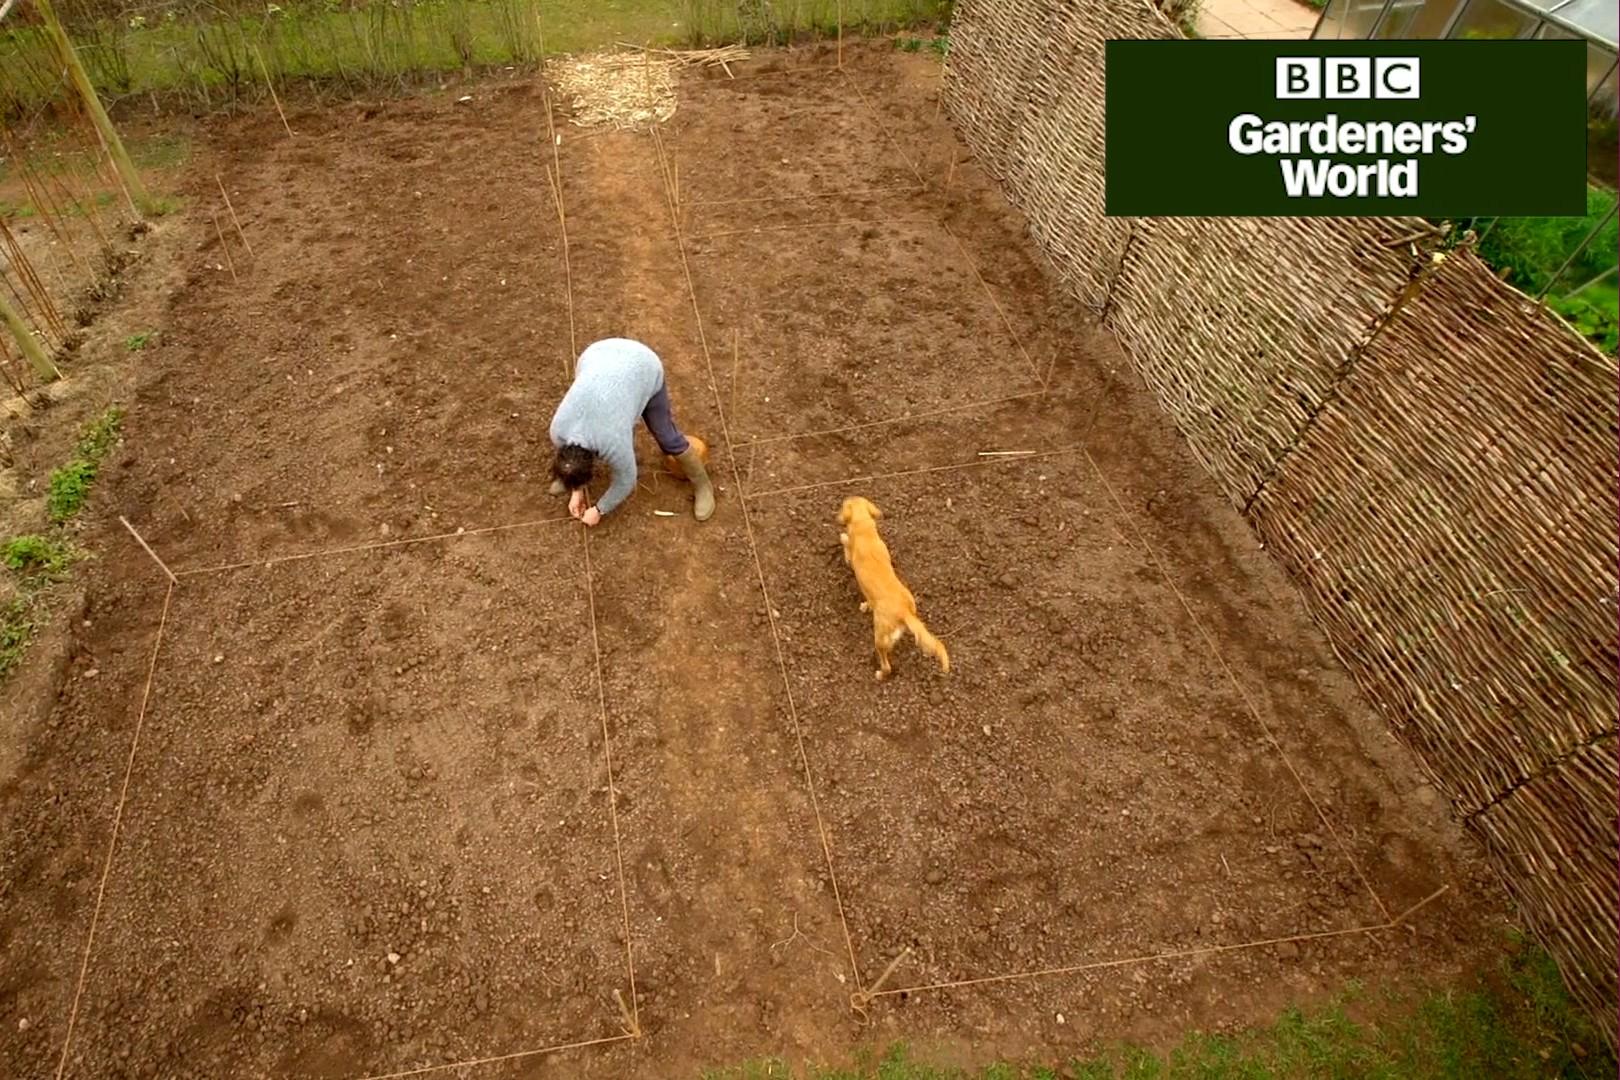 Monty Don marking out a new veg plot